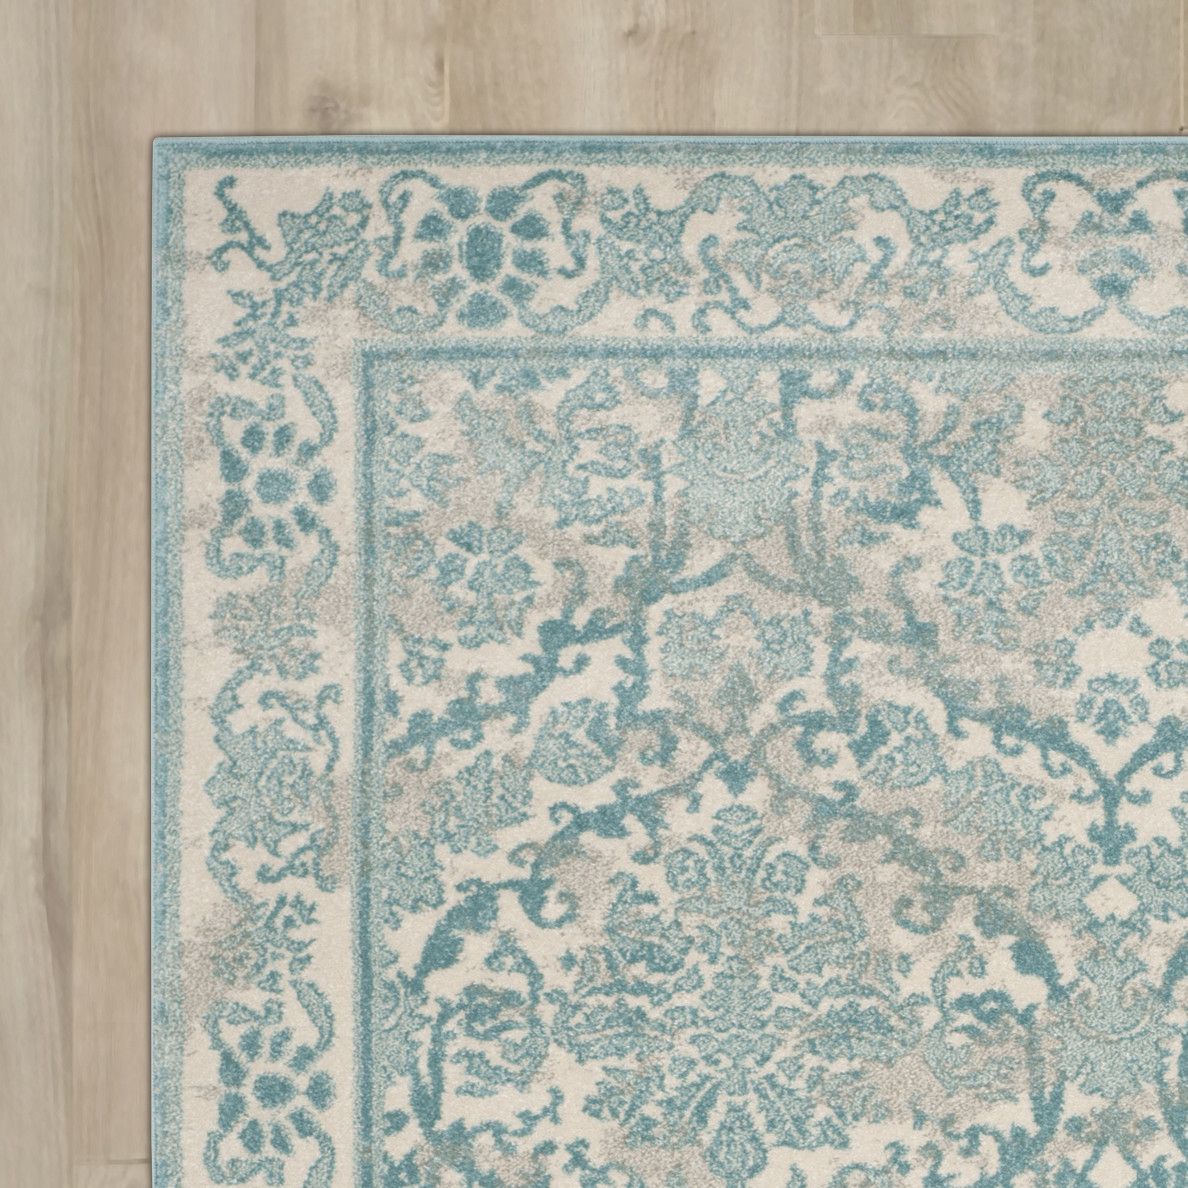 Chic Lark Manoru0026trade; Montelimar Ivory/Light Blue Area Rug light blue area rug